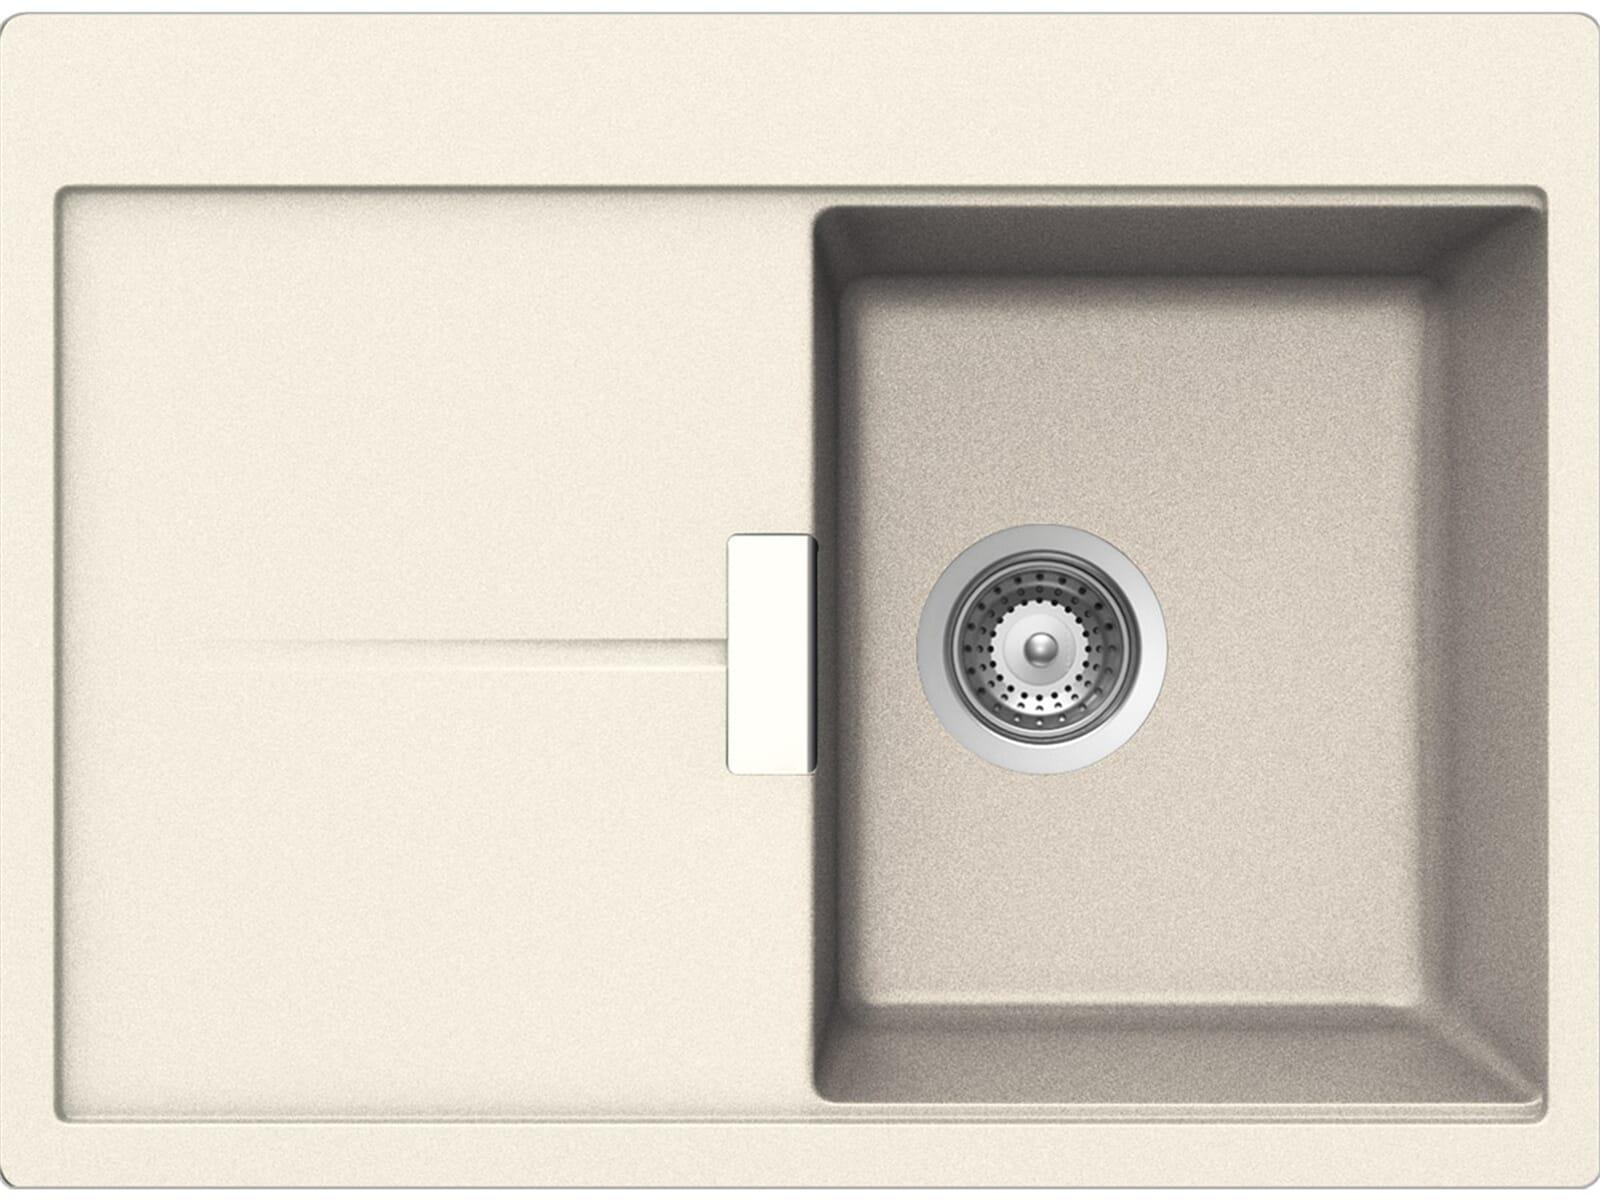 schock horizont d 100 s a magnolia granitsp le. Black Bedroom Furniture Sets. Home Design Ideas